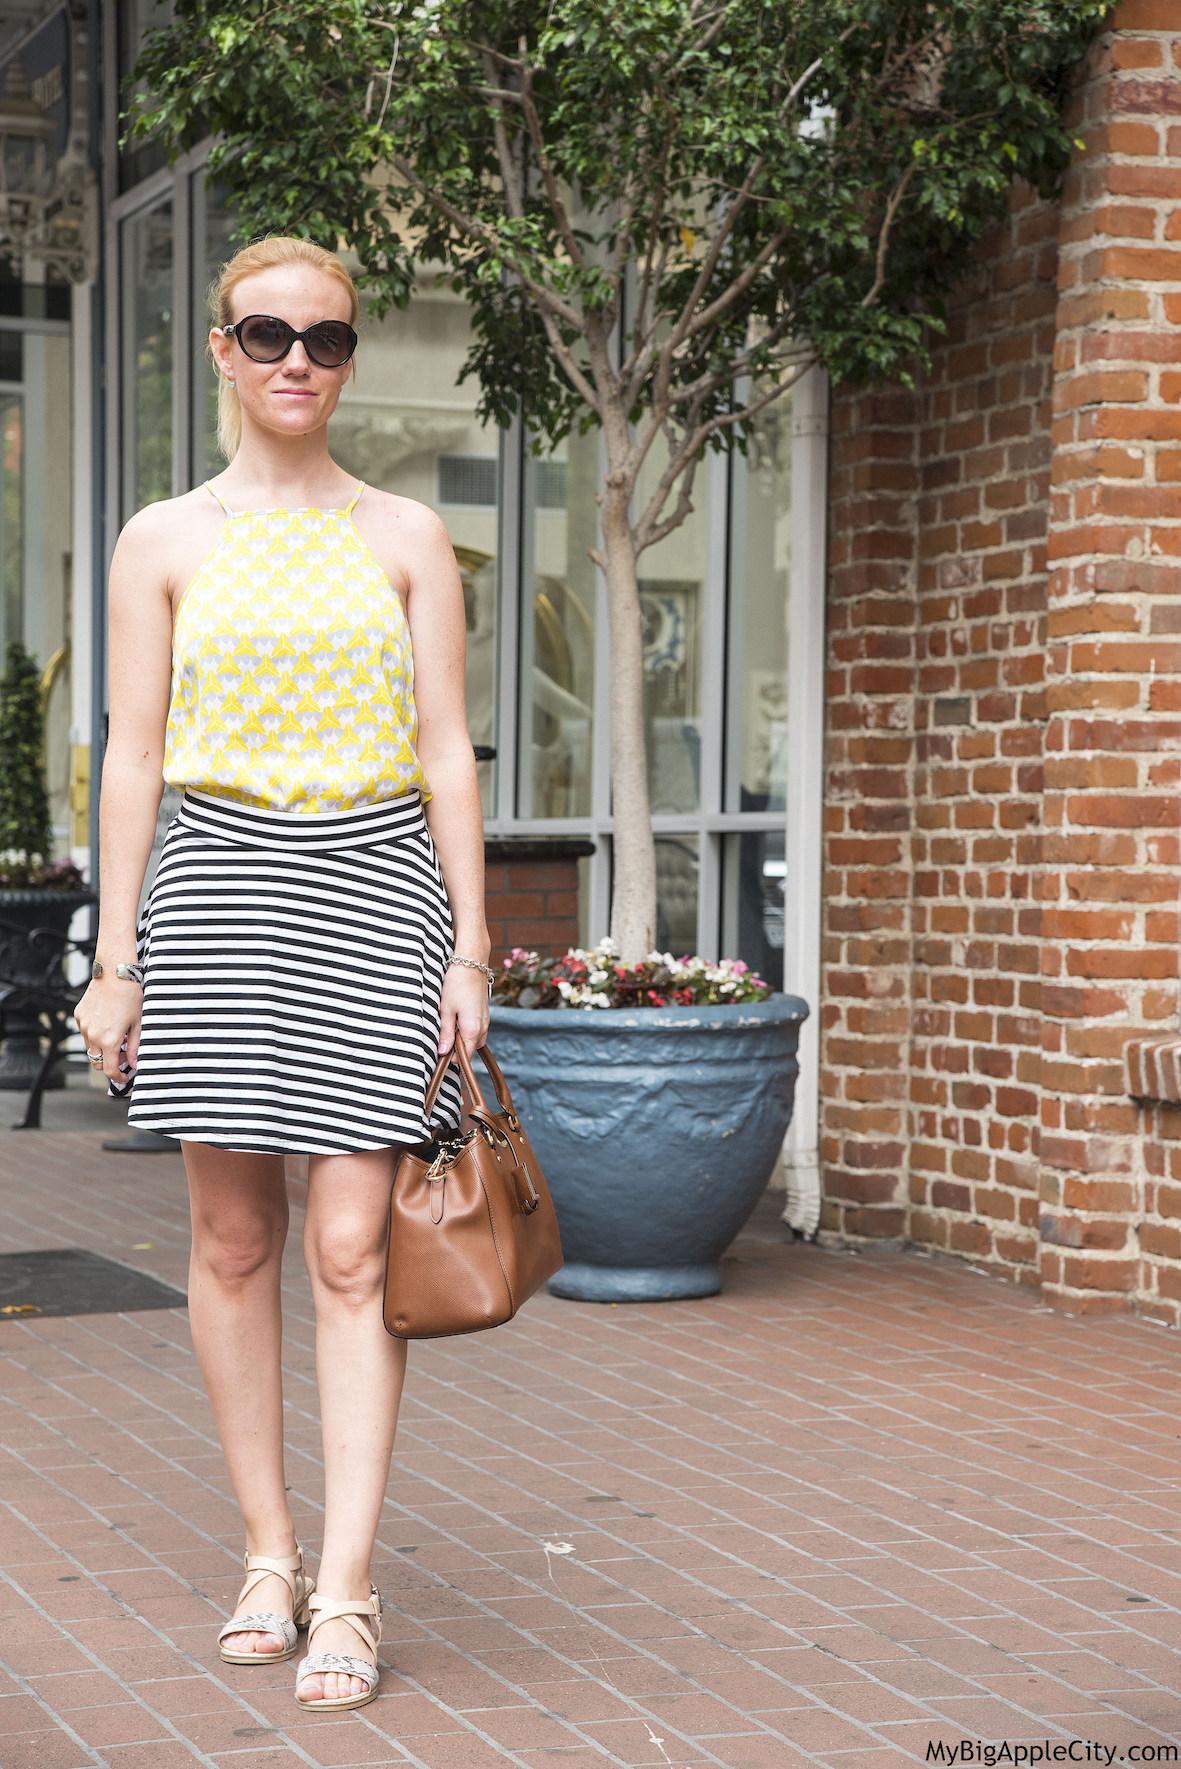 Fashion-blogger-ootd-travel-san-diego-mybigapplecity